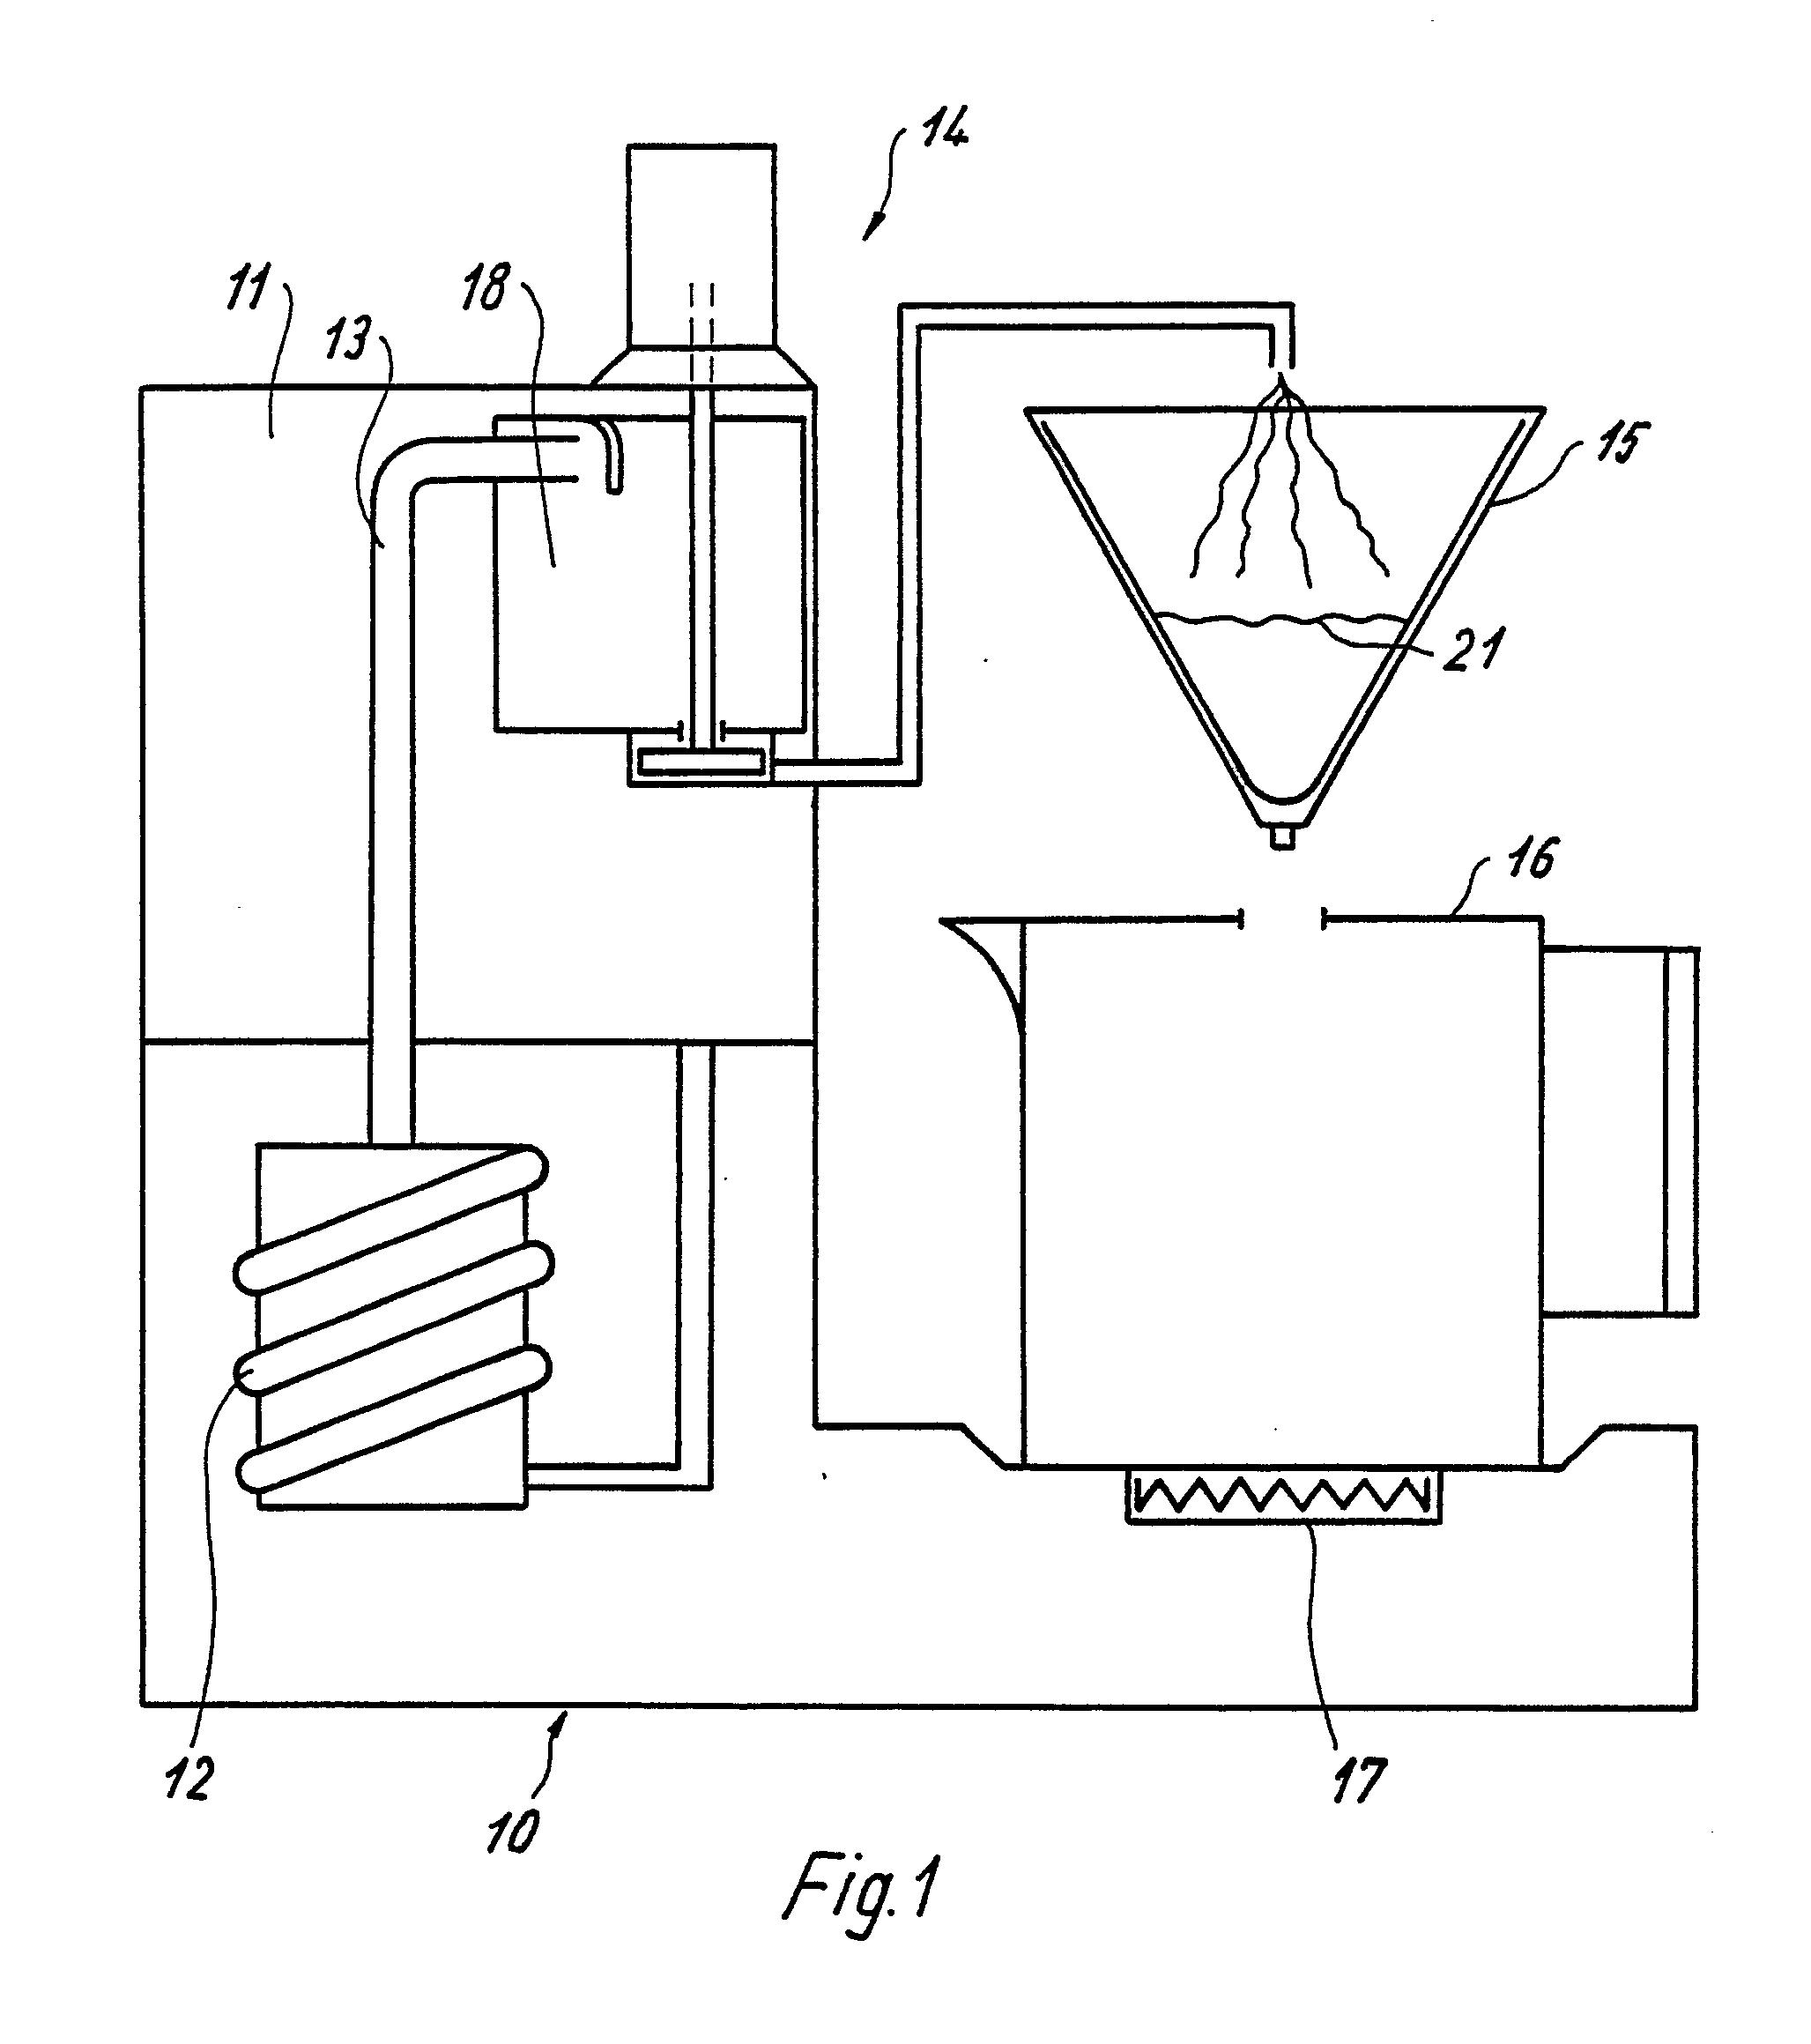 patent ep0274562a1 kaffee oder teemaschine google patents. Black Bedroom Furniture Sets. Home Design Ideas